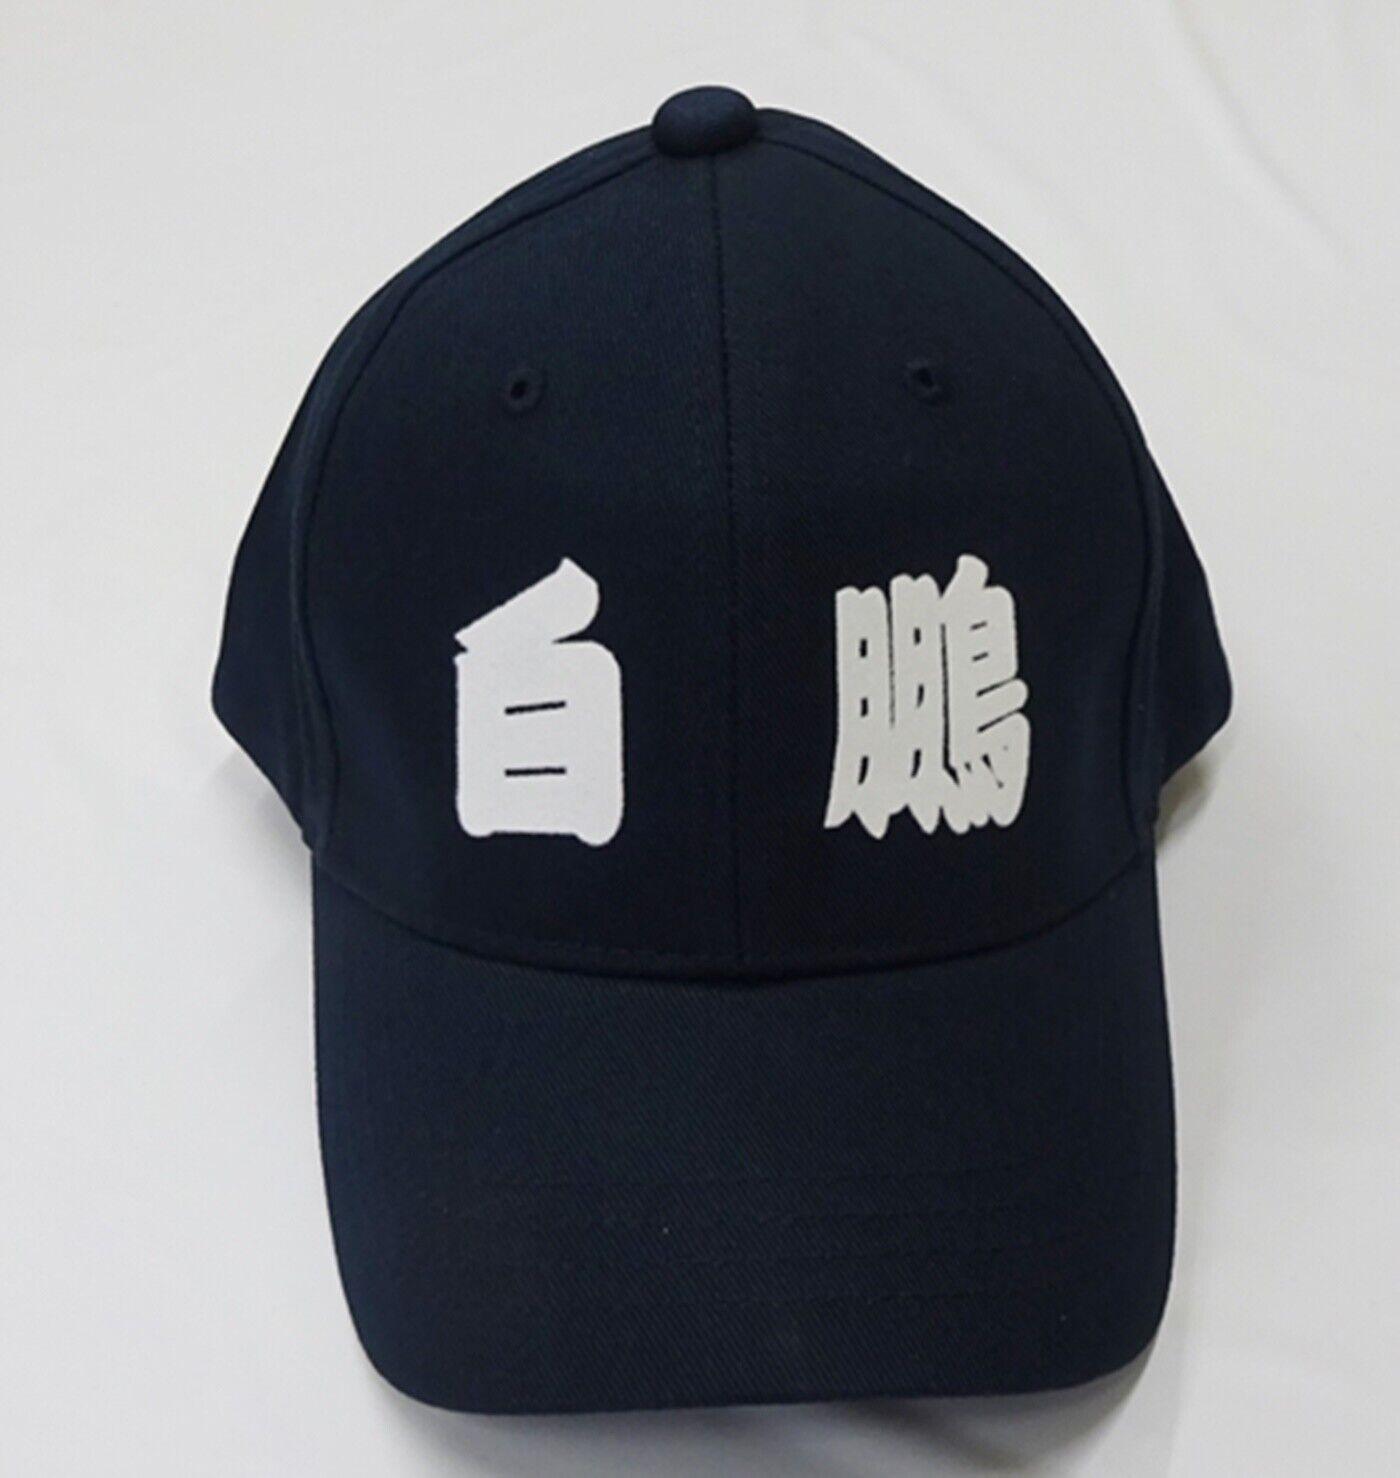 Sumo Hakuho hat cap Navy bluee Japanese Wrestler Wrestler Wrestler Champion Rikishi F S JAPAN 735811